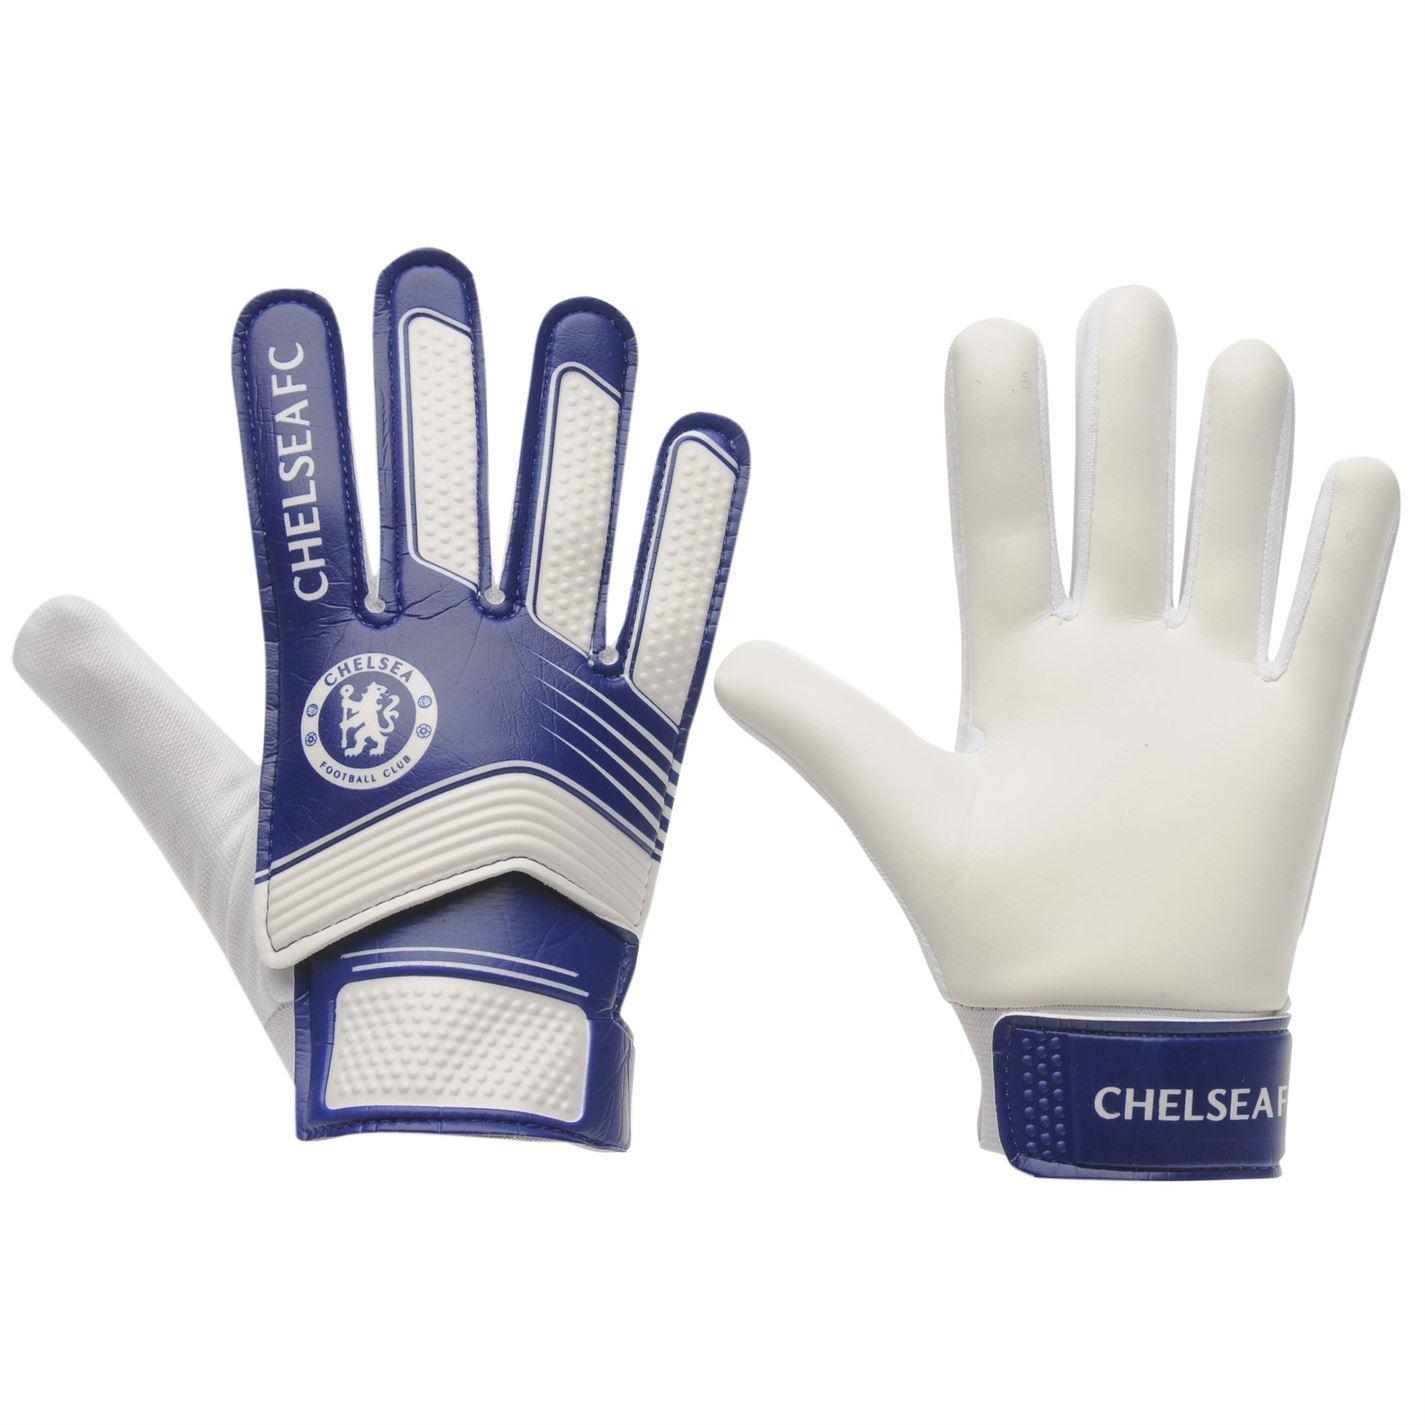 Image is loading Team-Kids-Boys-Football-Goalkeeper-Gloves -Junior-Lightweight eee33e39a947